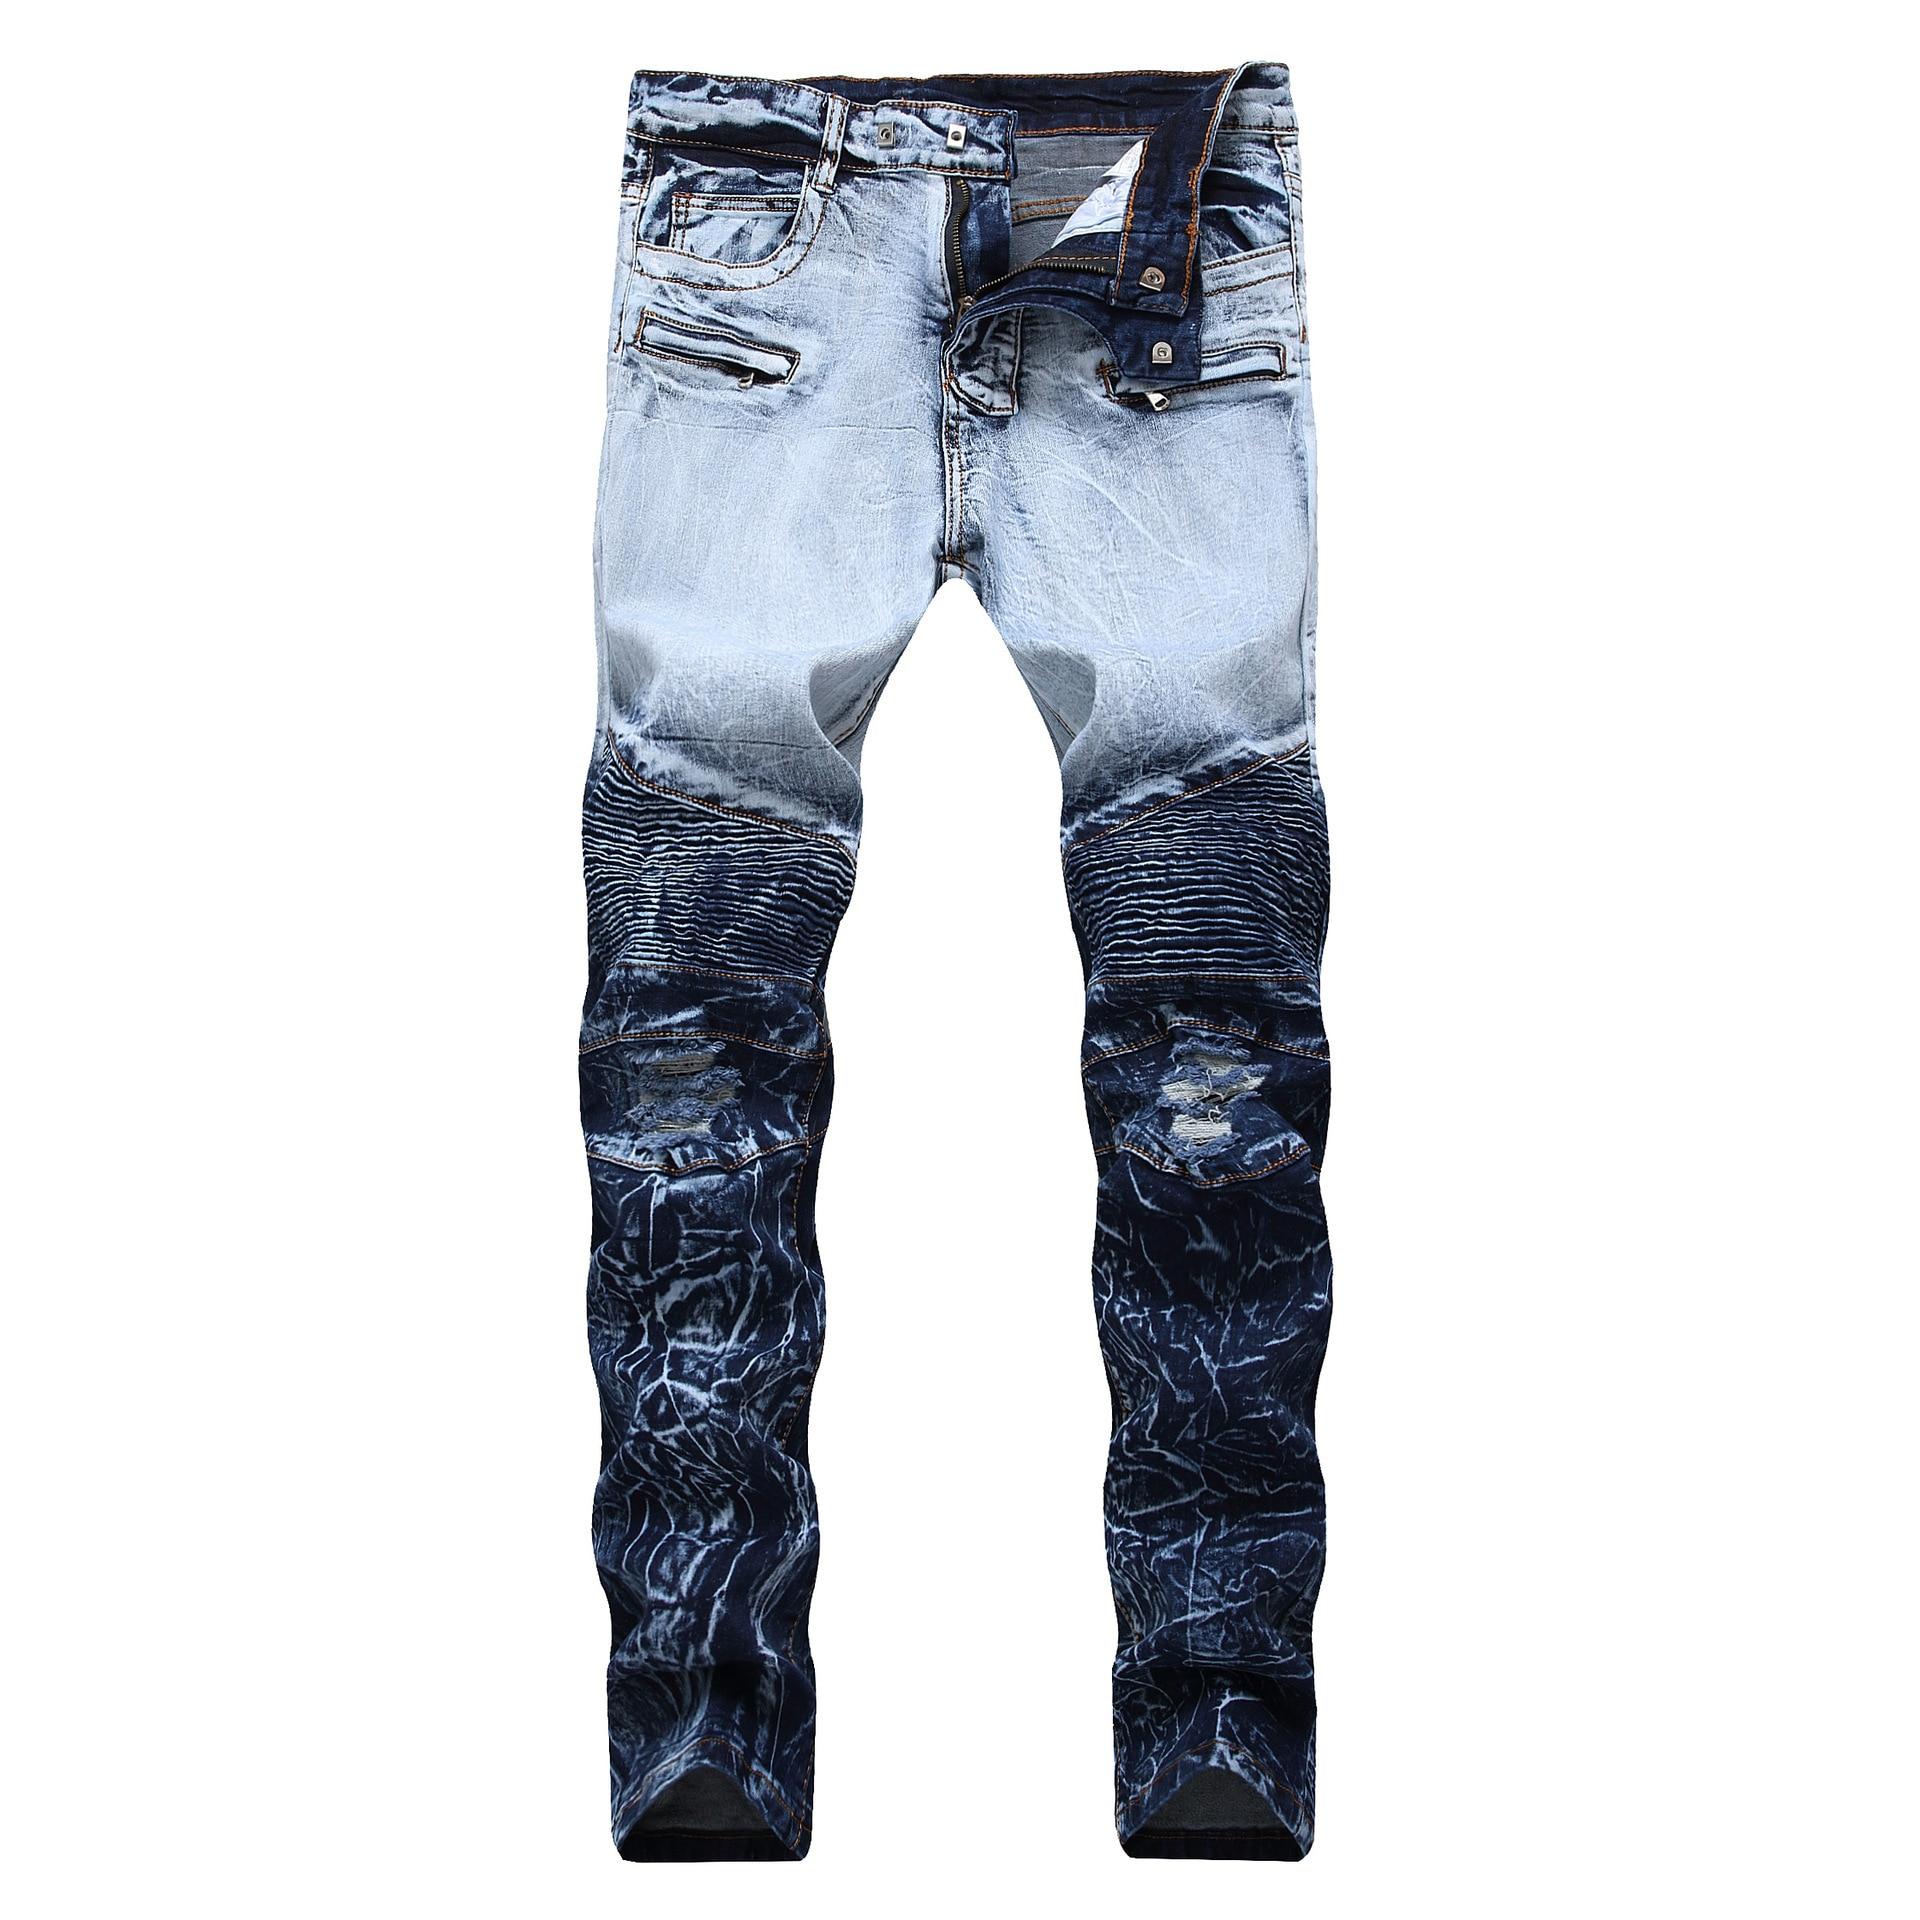 2020 AUTUMN Spring Men's Ripped Print Street HIP HOP Punk Stretch Bike Jeans Trendy Holes Straight Denim Trouers